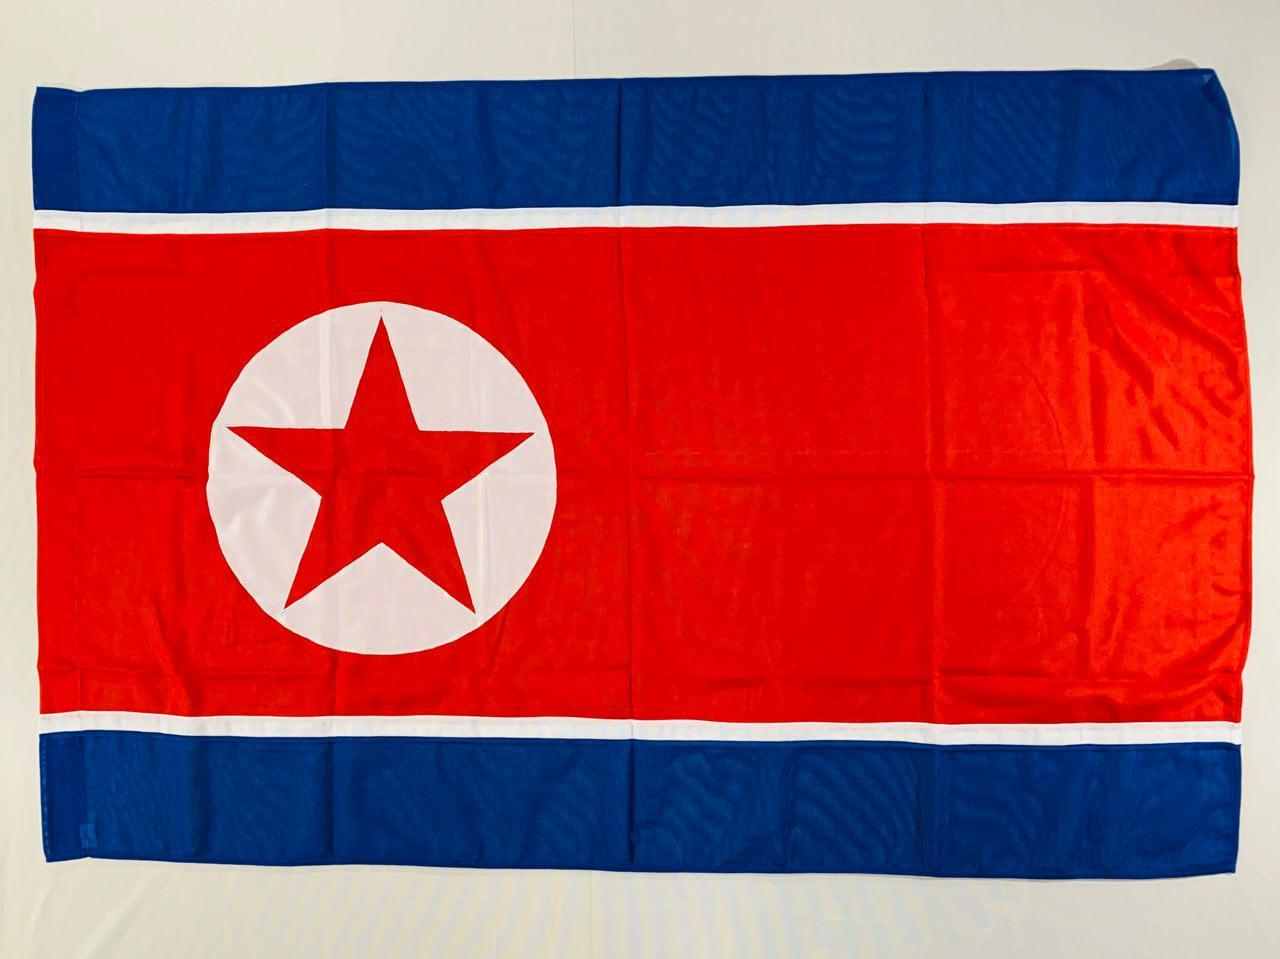 Флаг Северной Кореи (Аппликация) - (1м*1.5м)